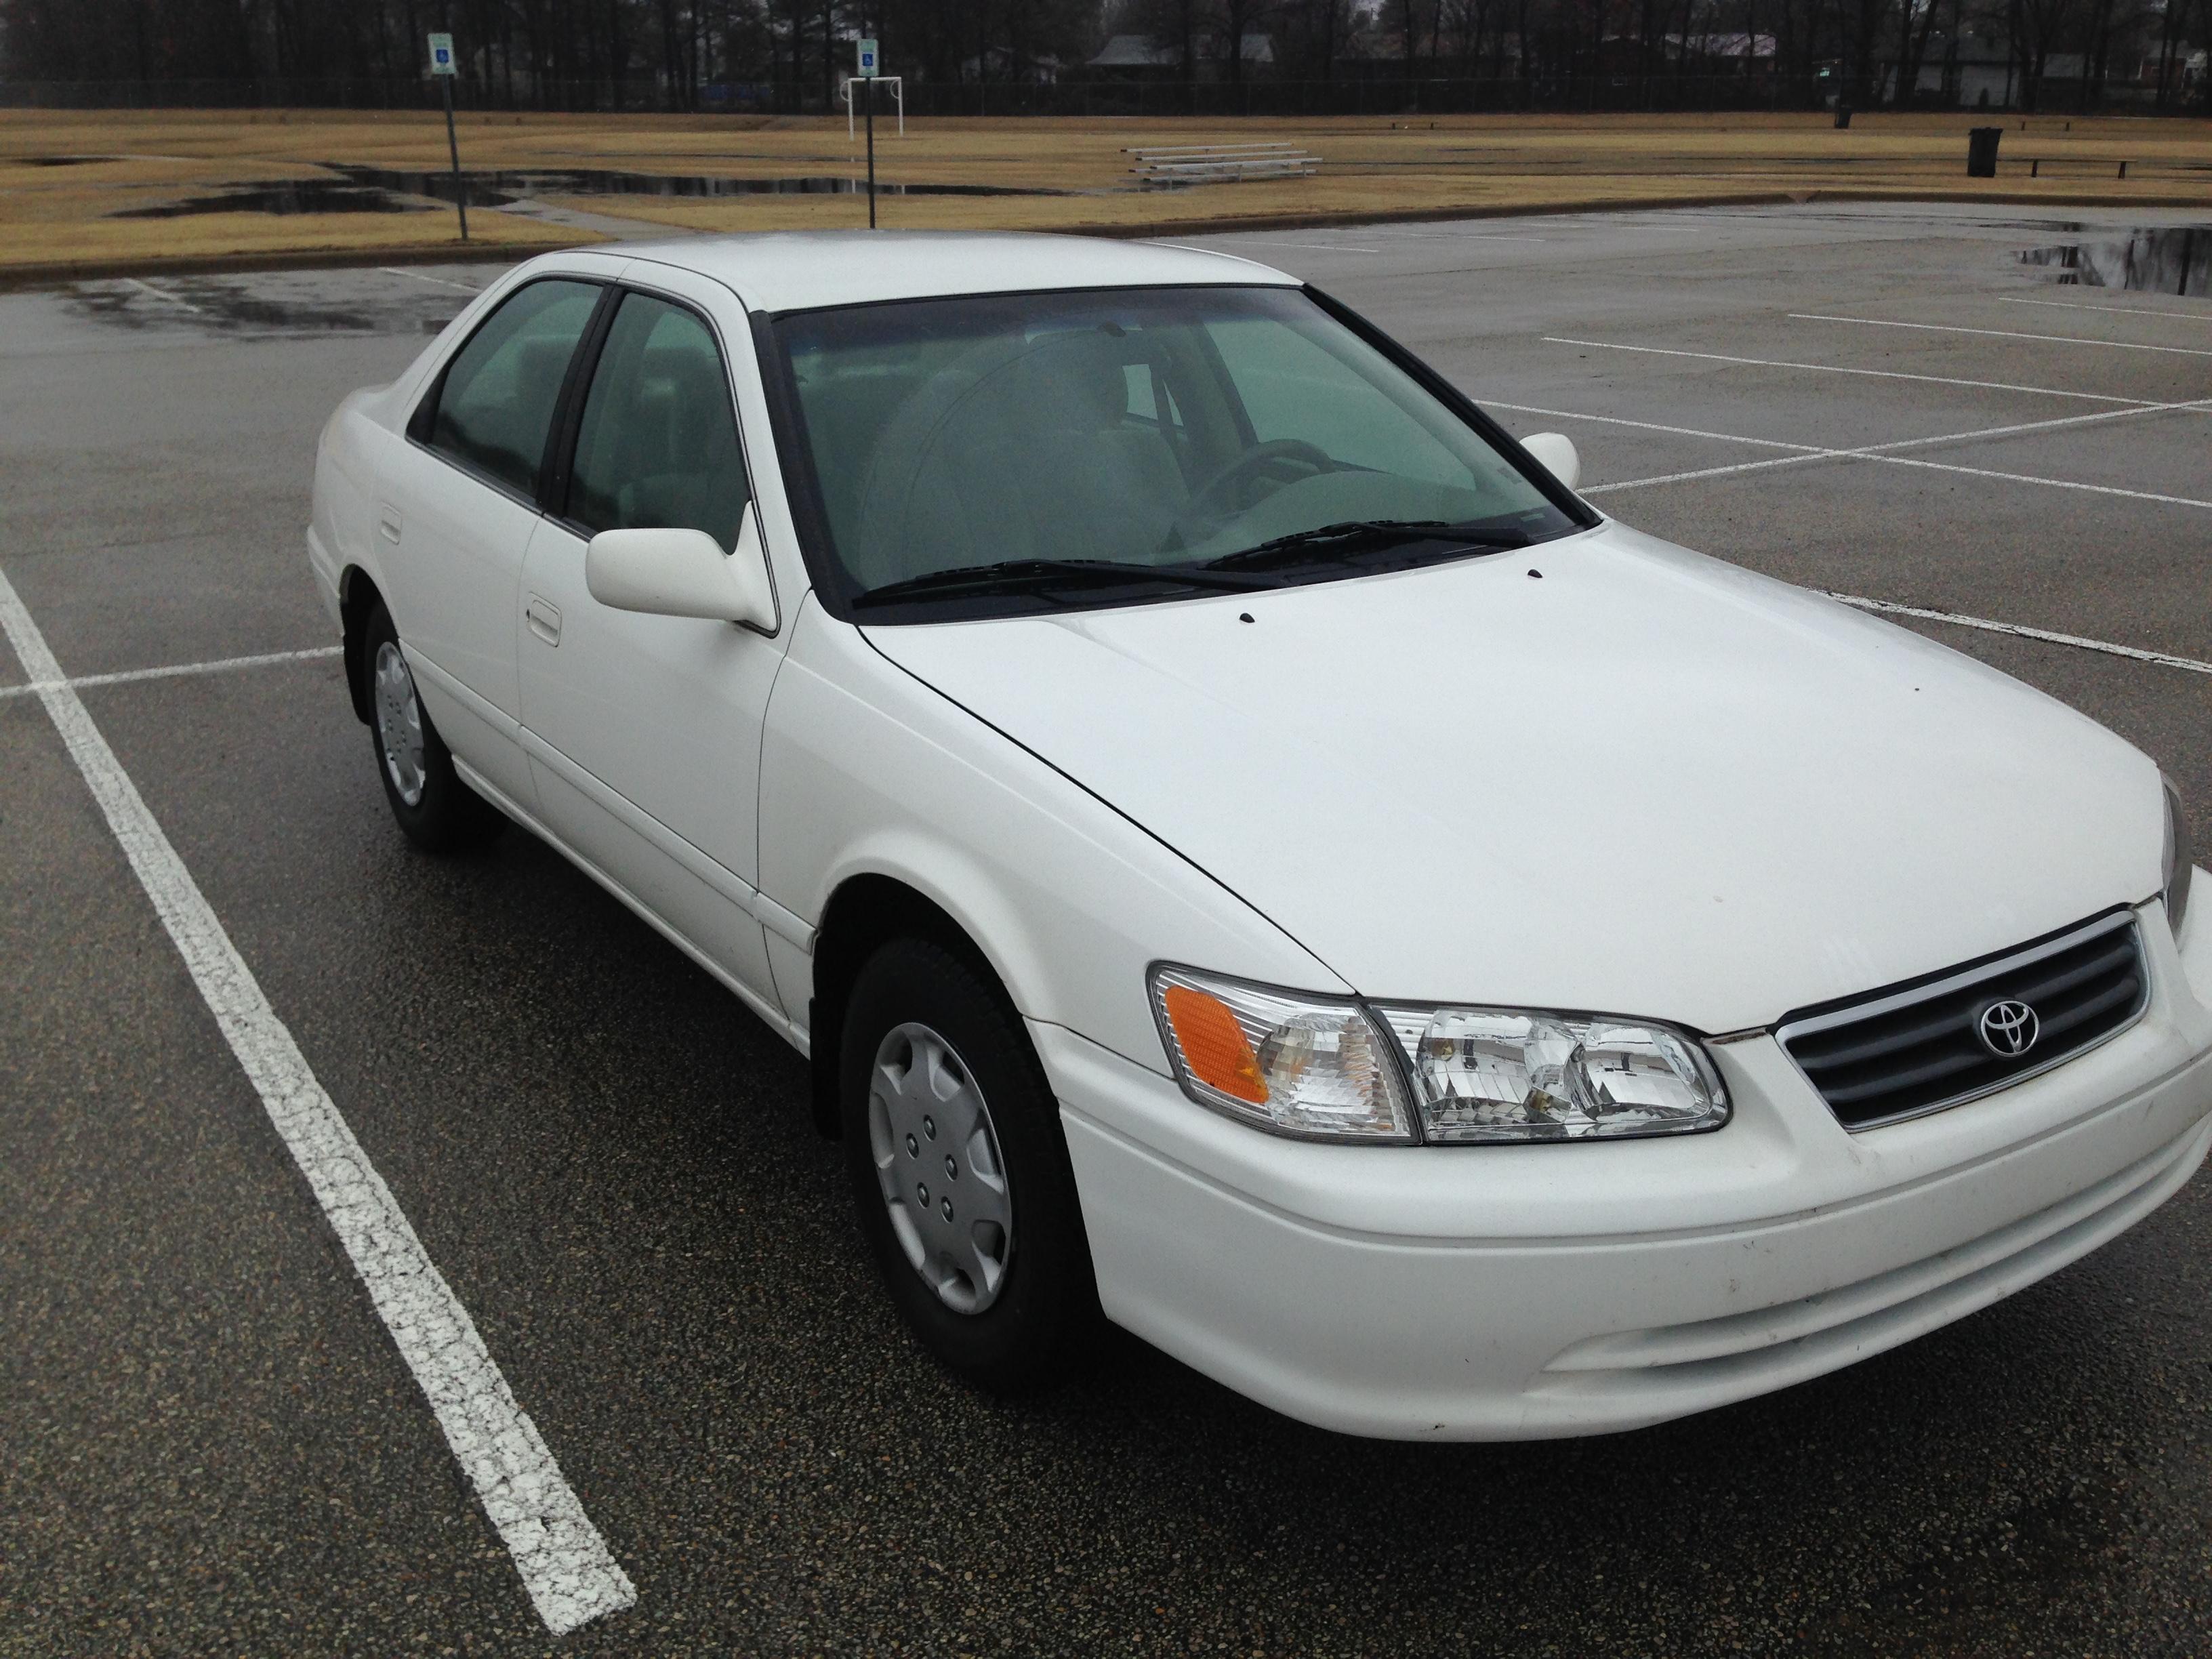 White 2000 Toyota Camry J Amp L Auto Sales